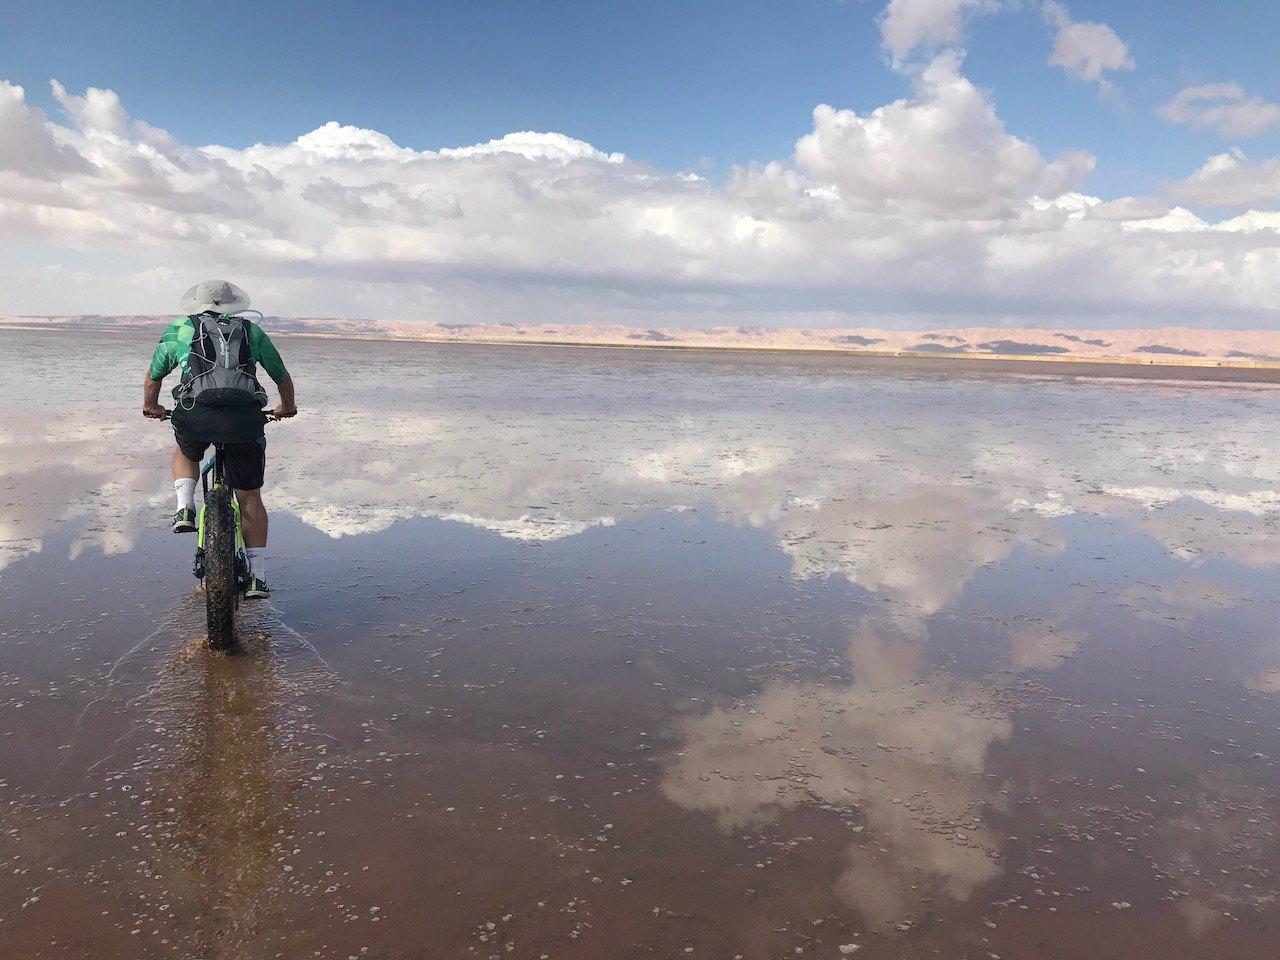 pedalando-sulle-nuvole-_Chott-el-Jerid-2